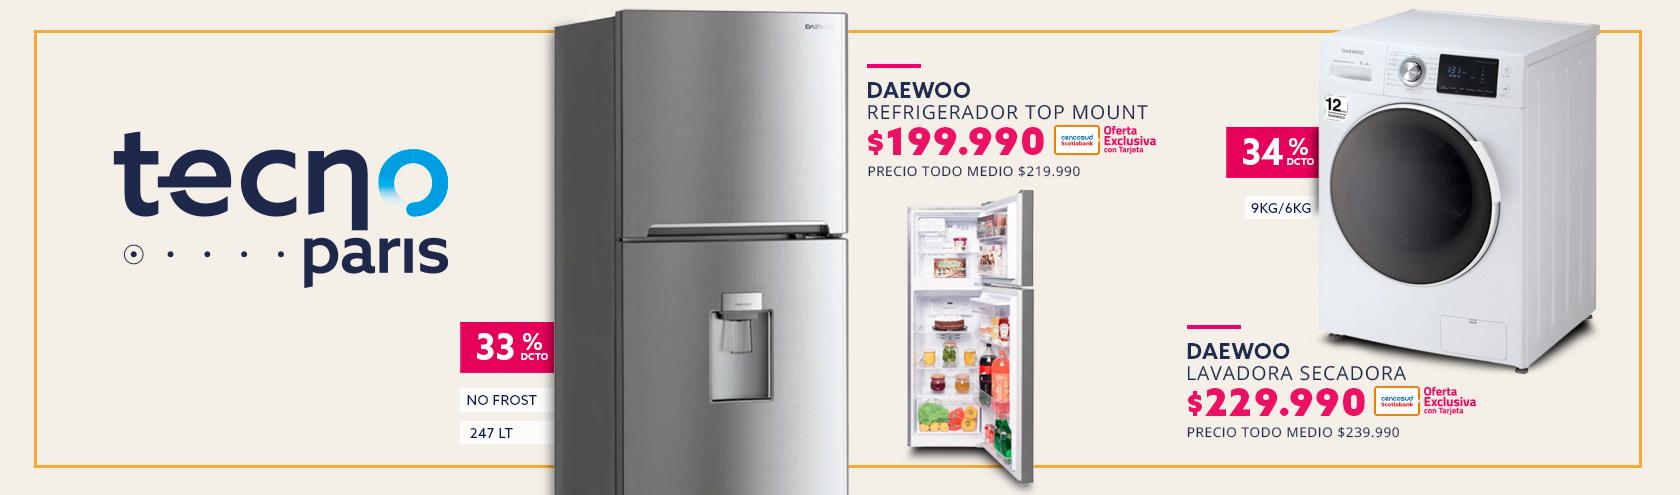 Refrigerador Top Mount Daewoo No Frost 247 Litros RGE27DIP